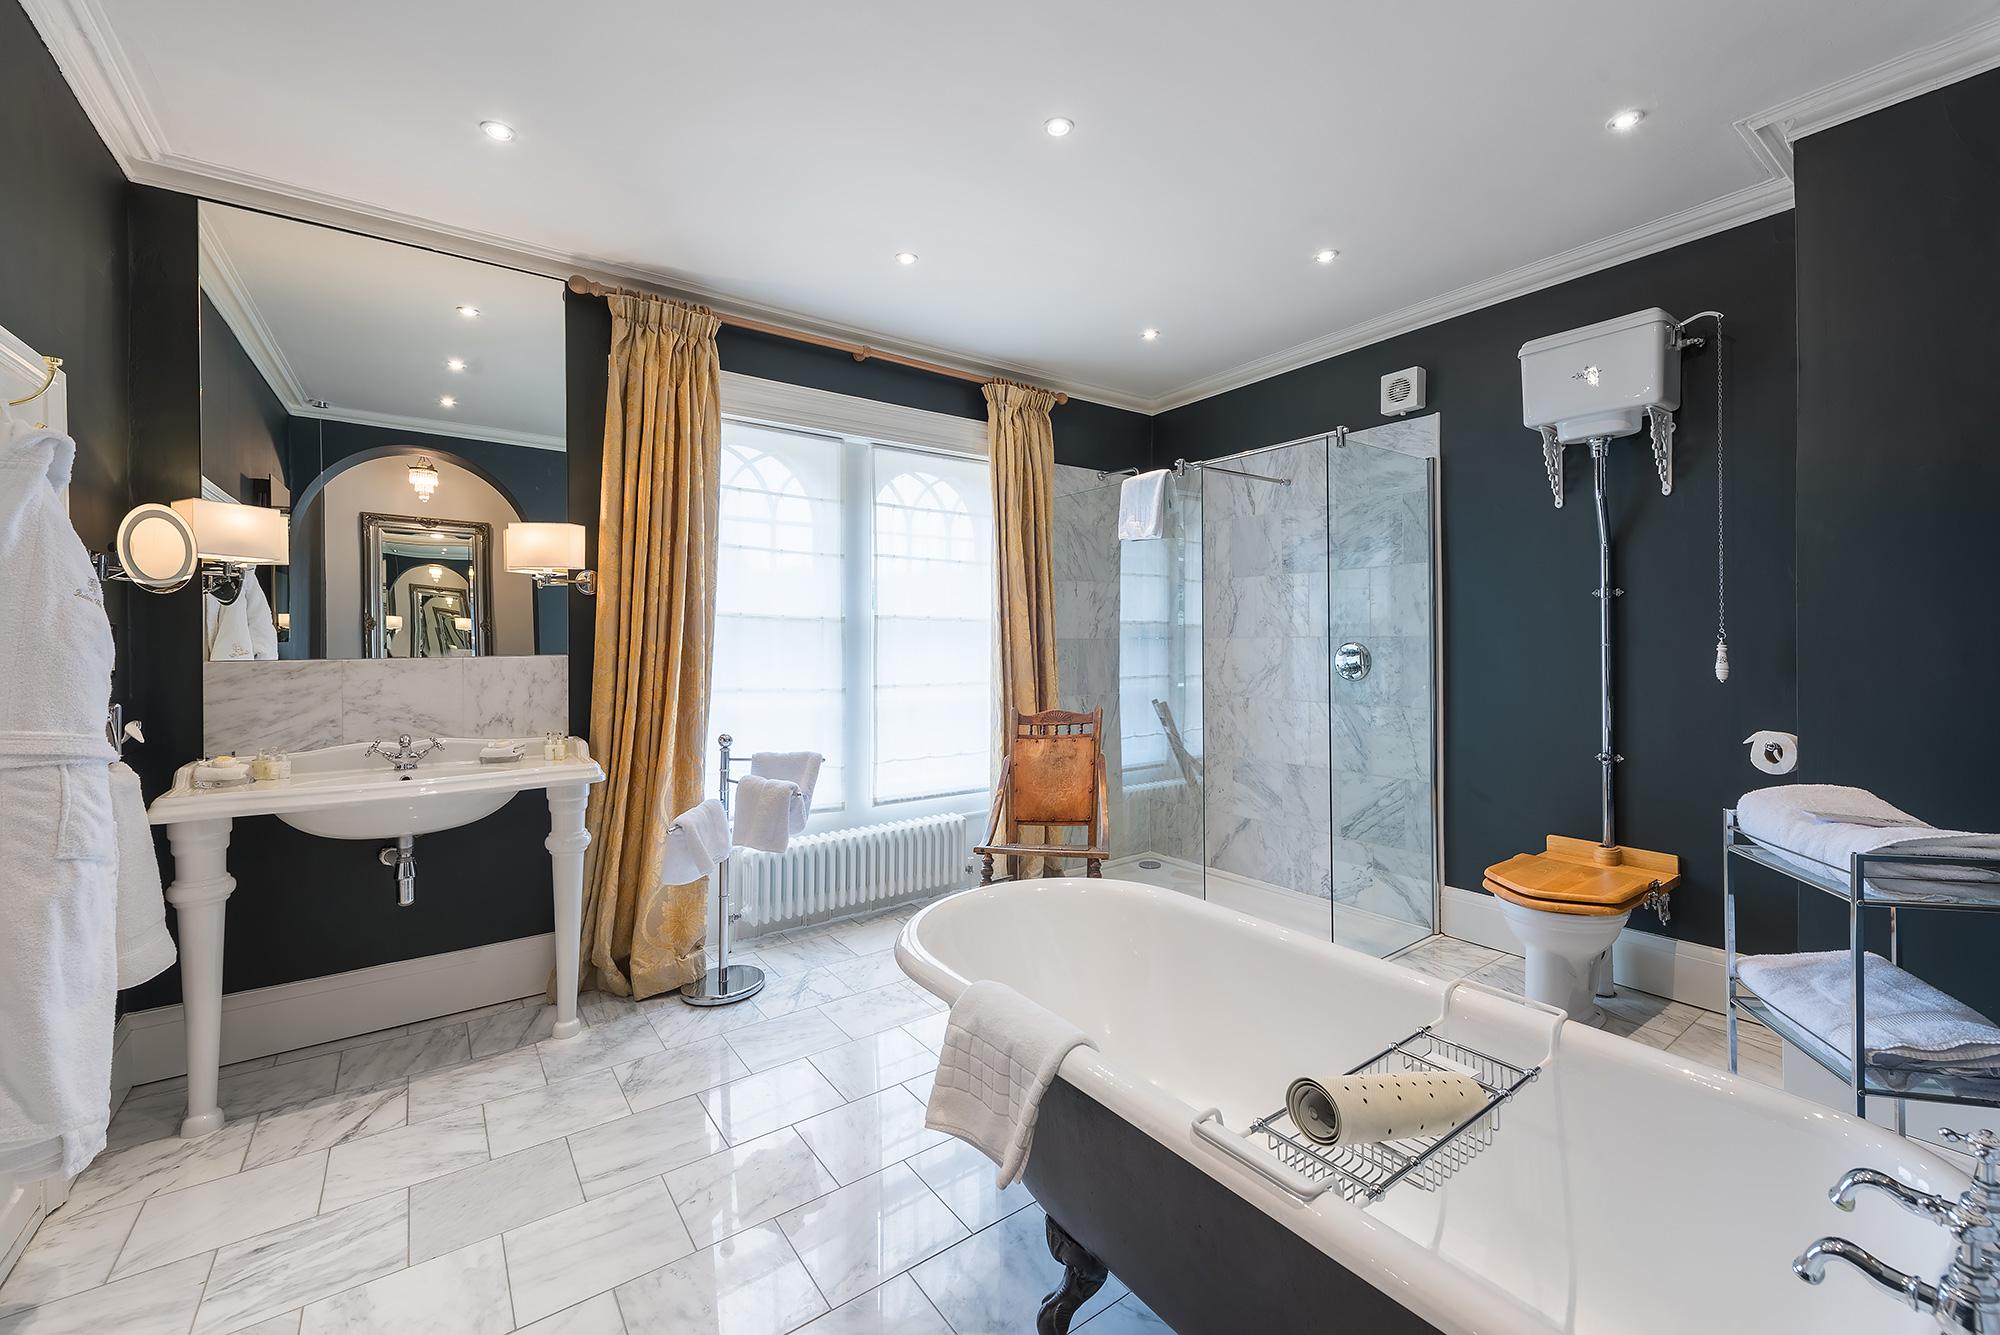 hotel-bathroom-photography.jpg